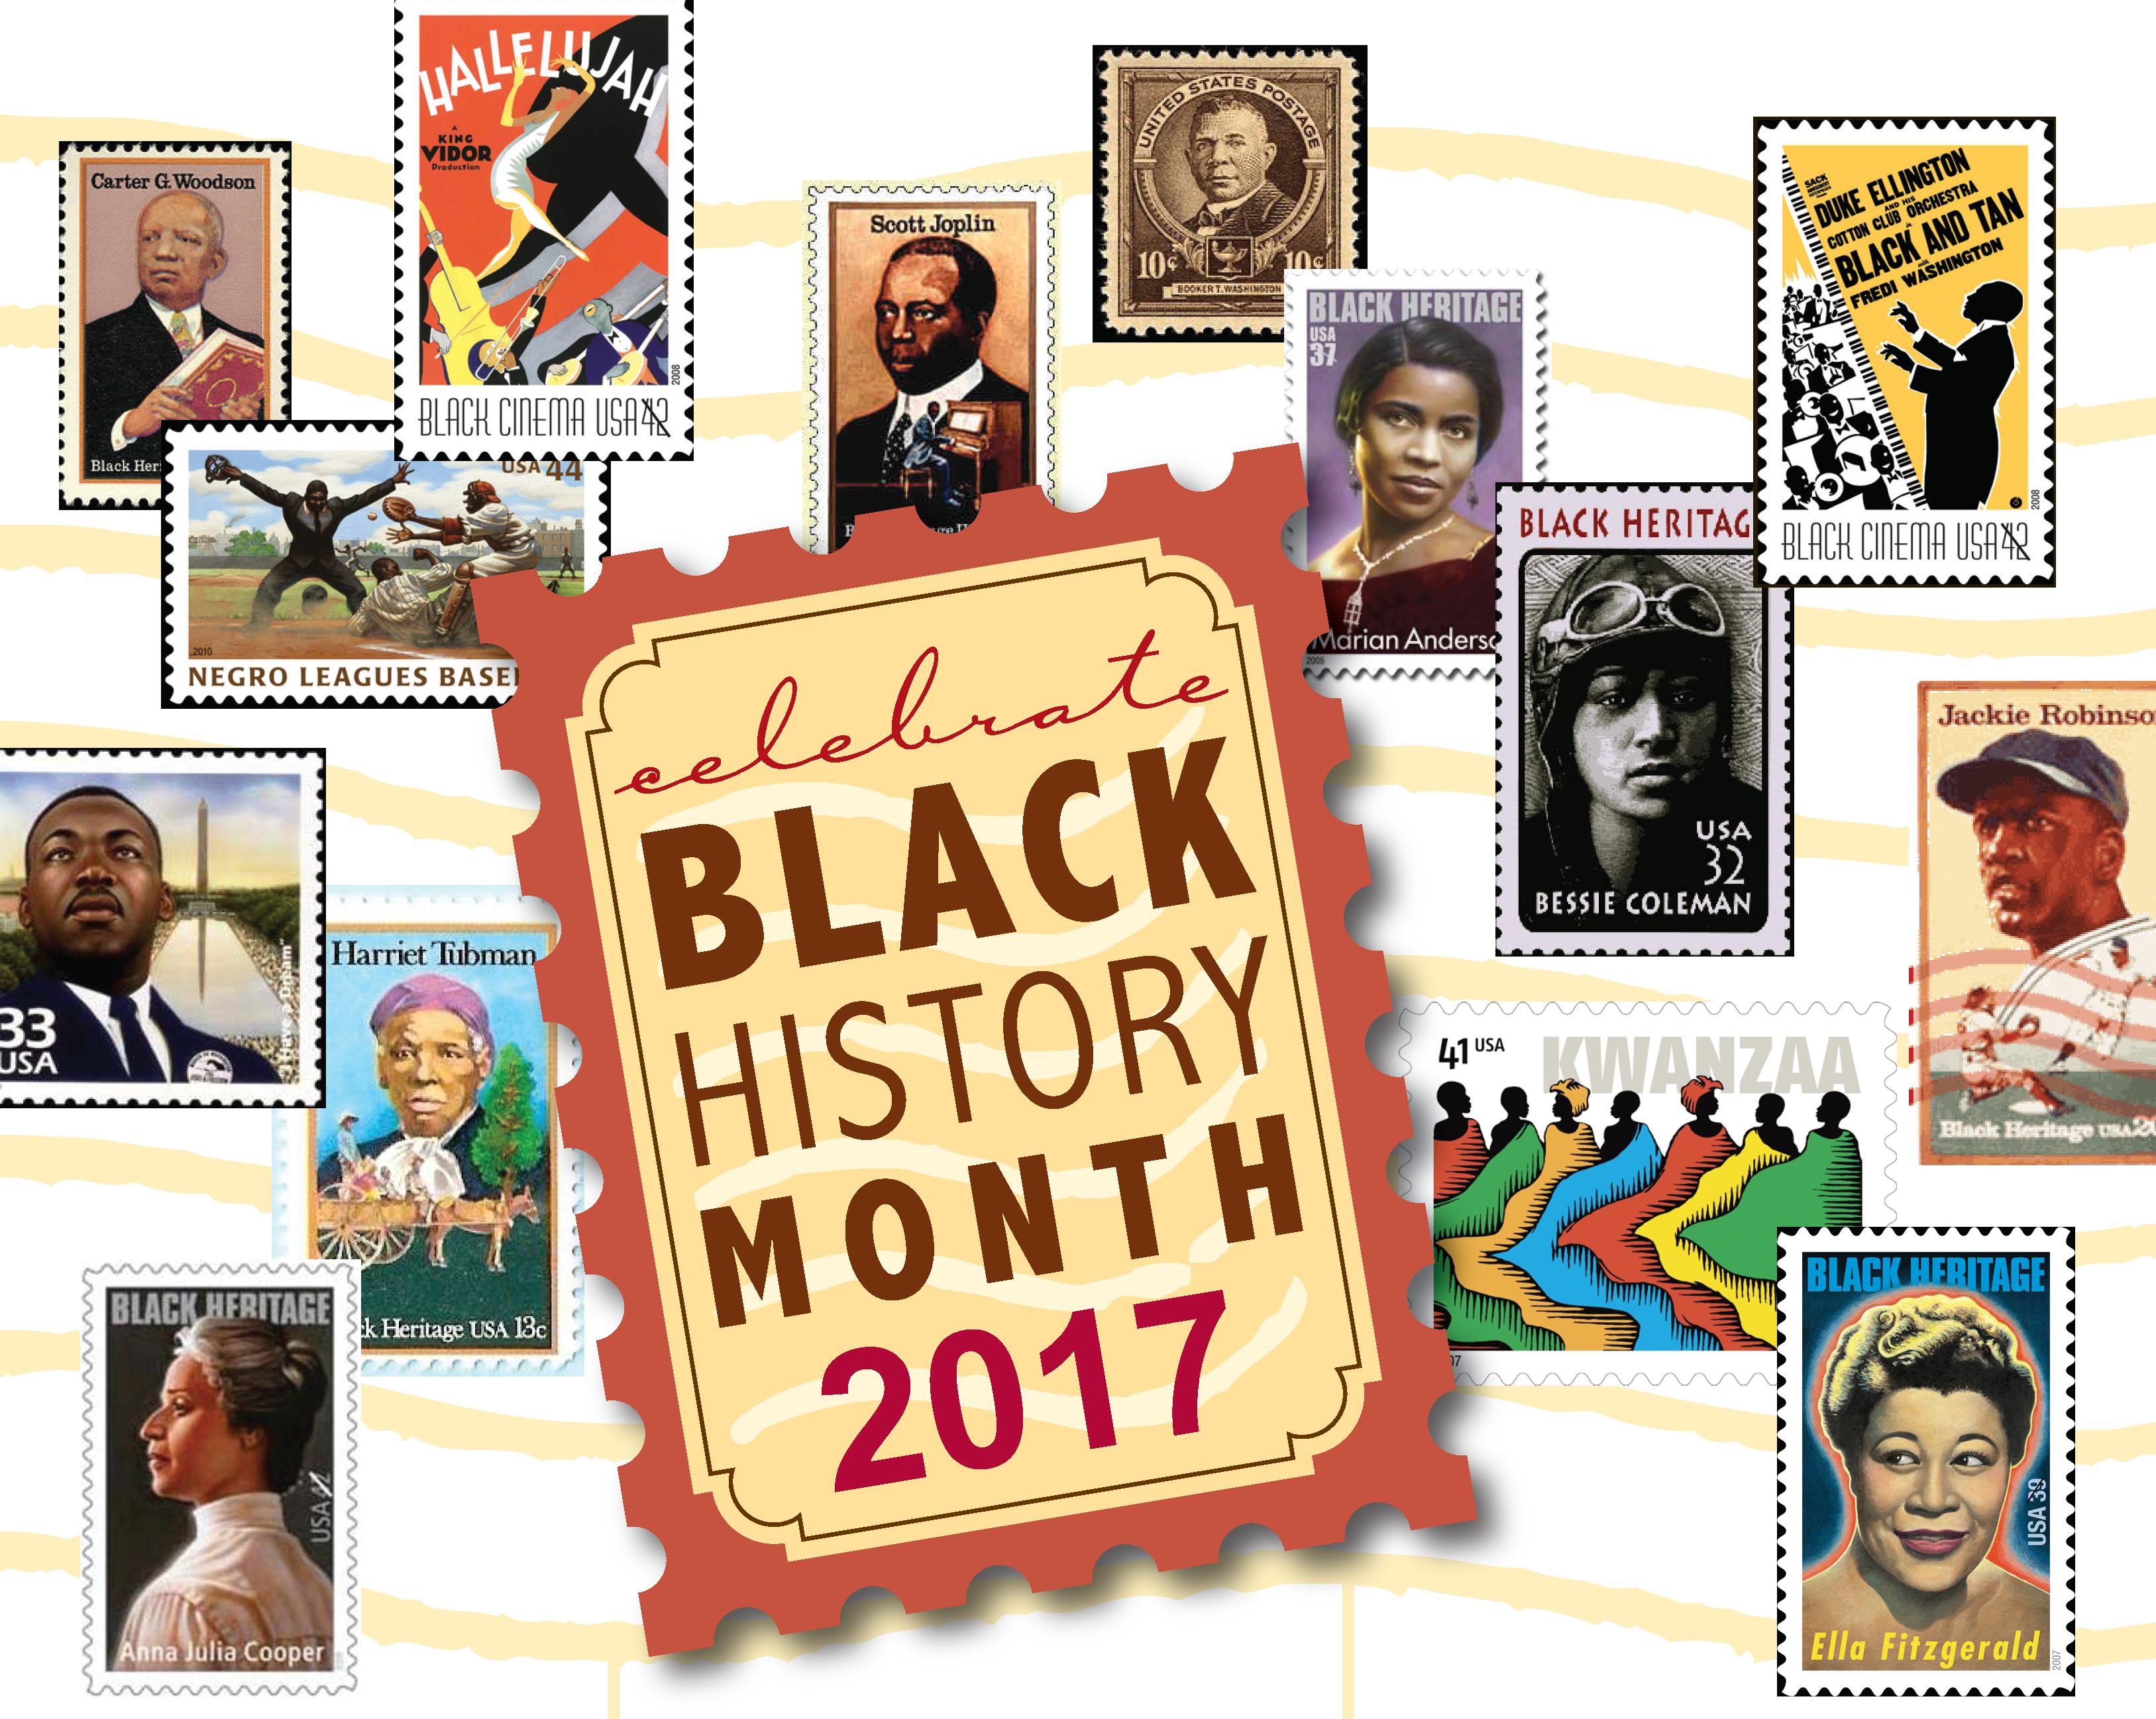 Black History Month 2017.